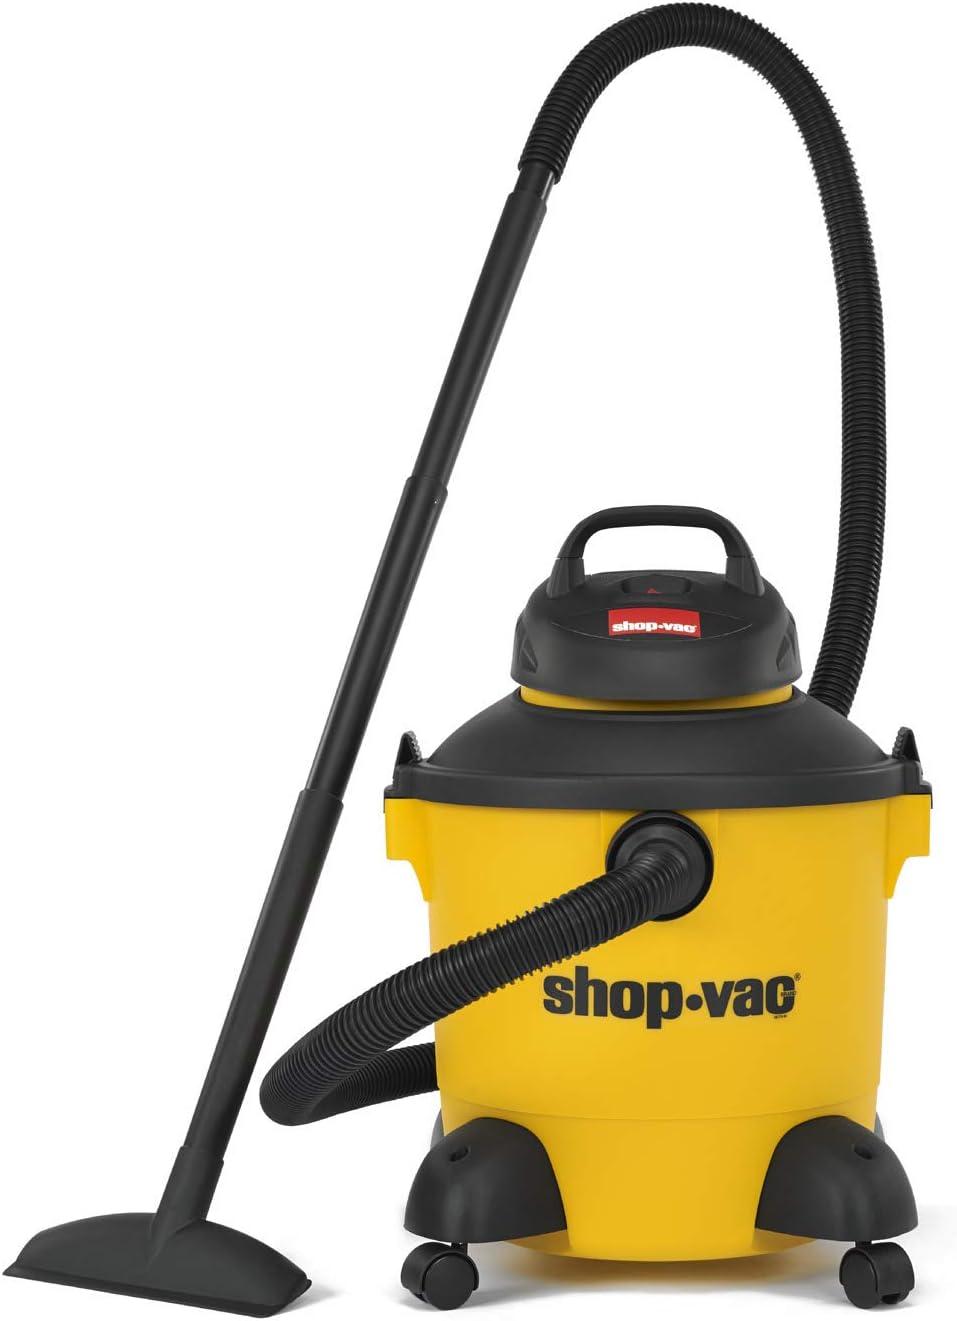 Shop-Vac 8 Gallon 4.0 Peak HP Wet/Dry Vacuum (5950803)